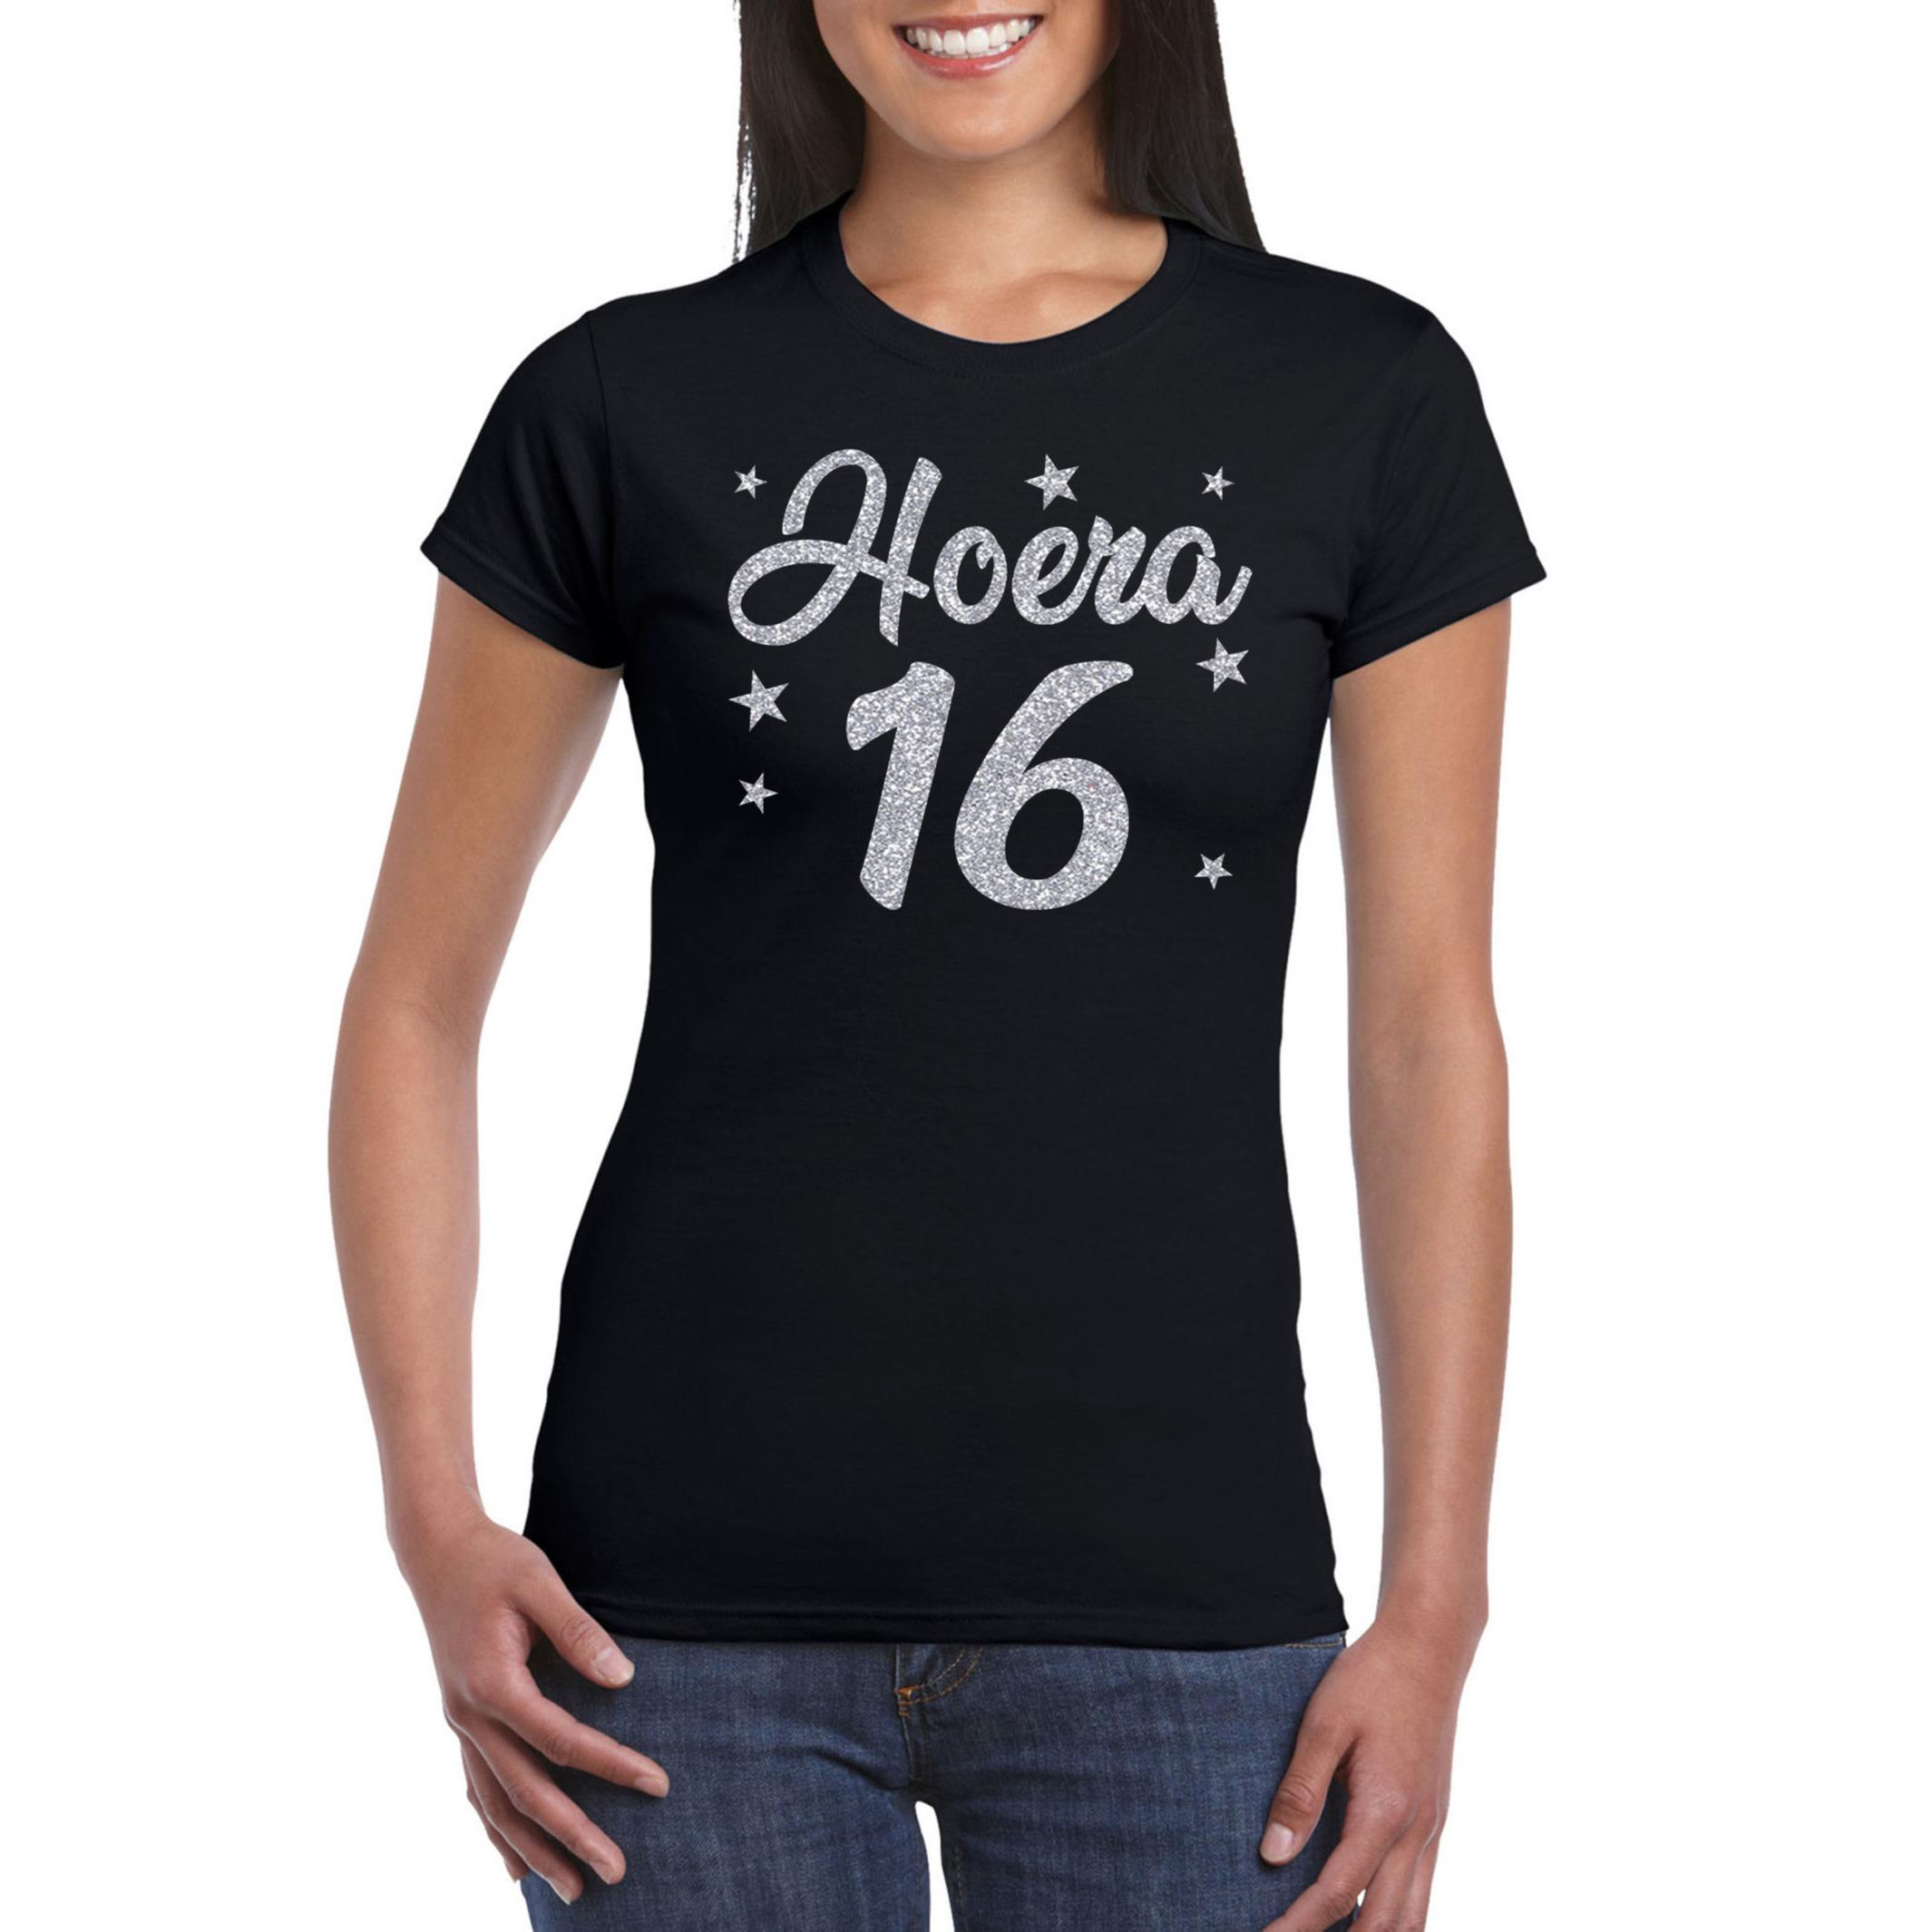 Hoera 16 jaar verjaardag cadeau t-shirt zilver glitter op zwart dames